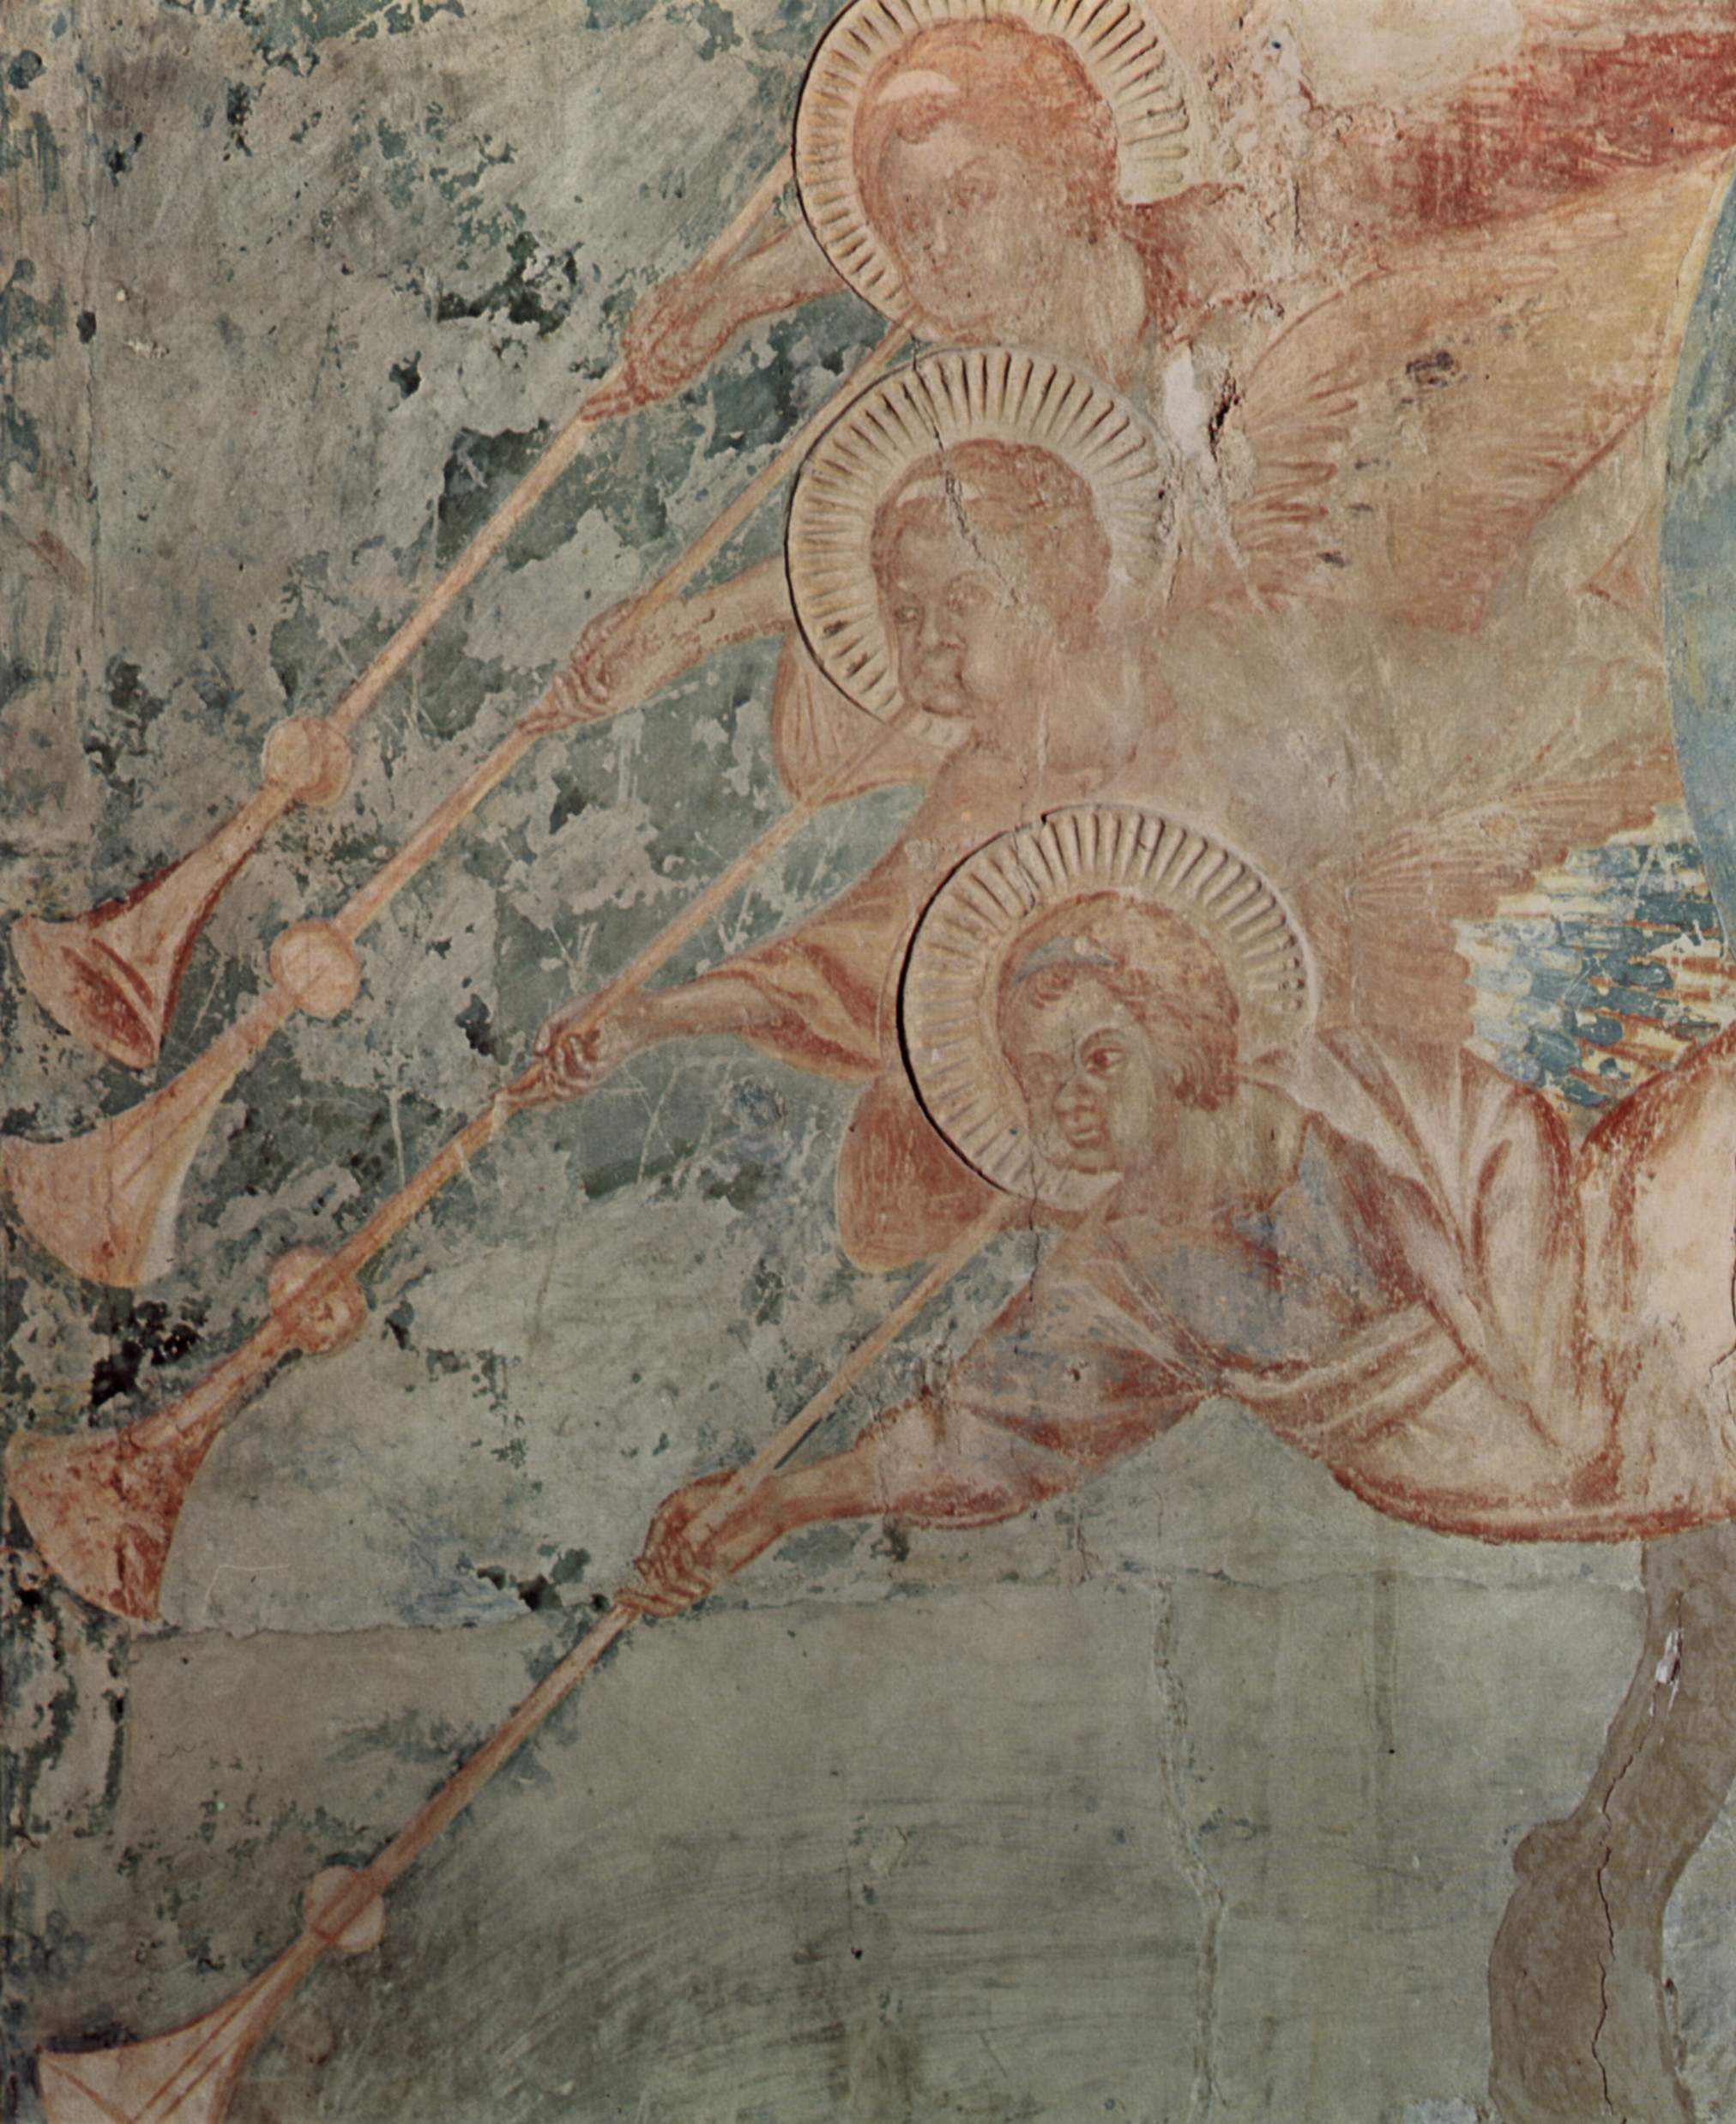 CIMABUE Apocalypse (angels) 1280-83